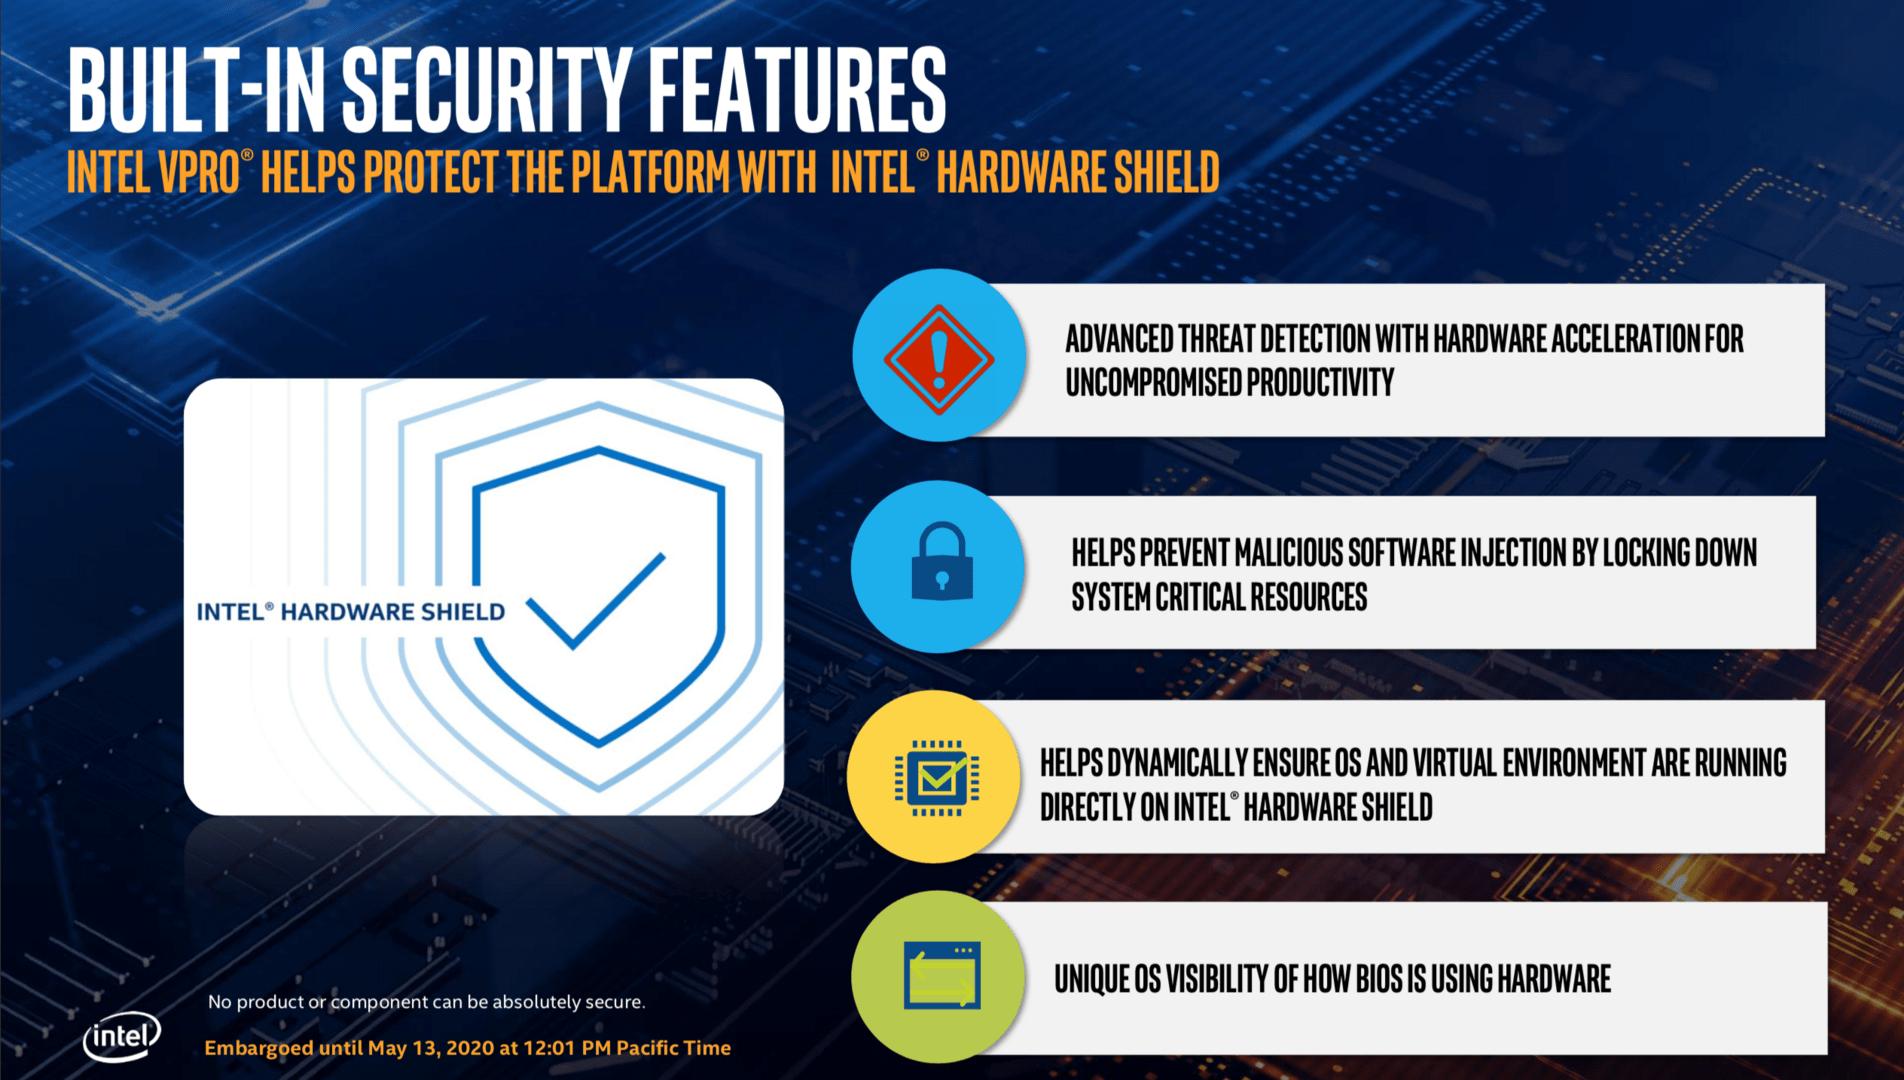 Intel Hardware Shield